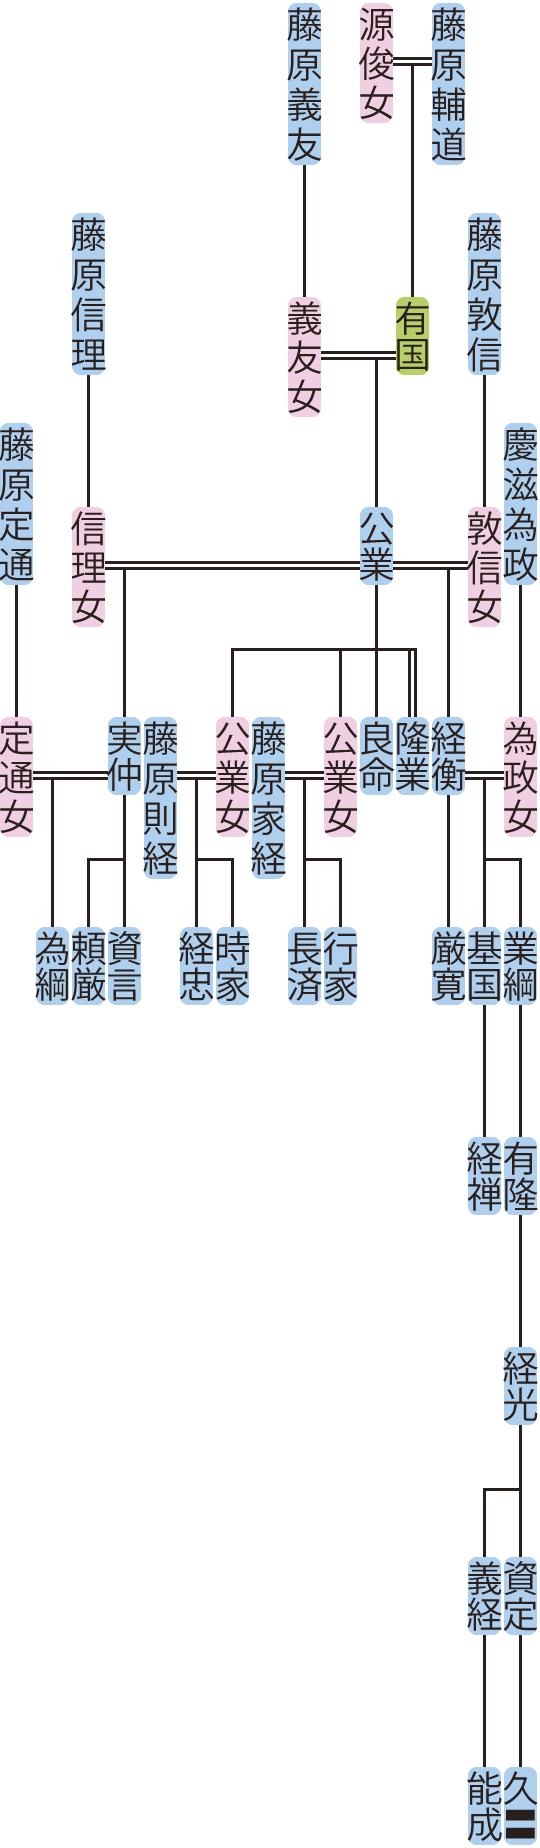 藤原公業の系図